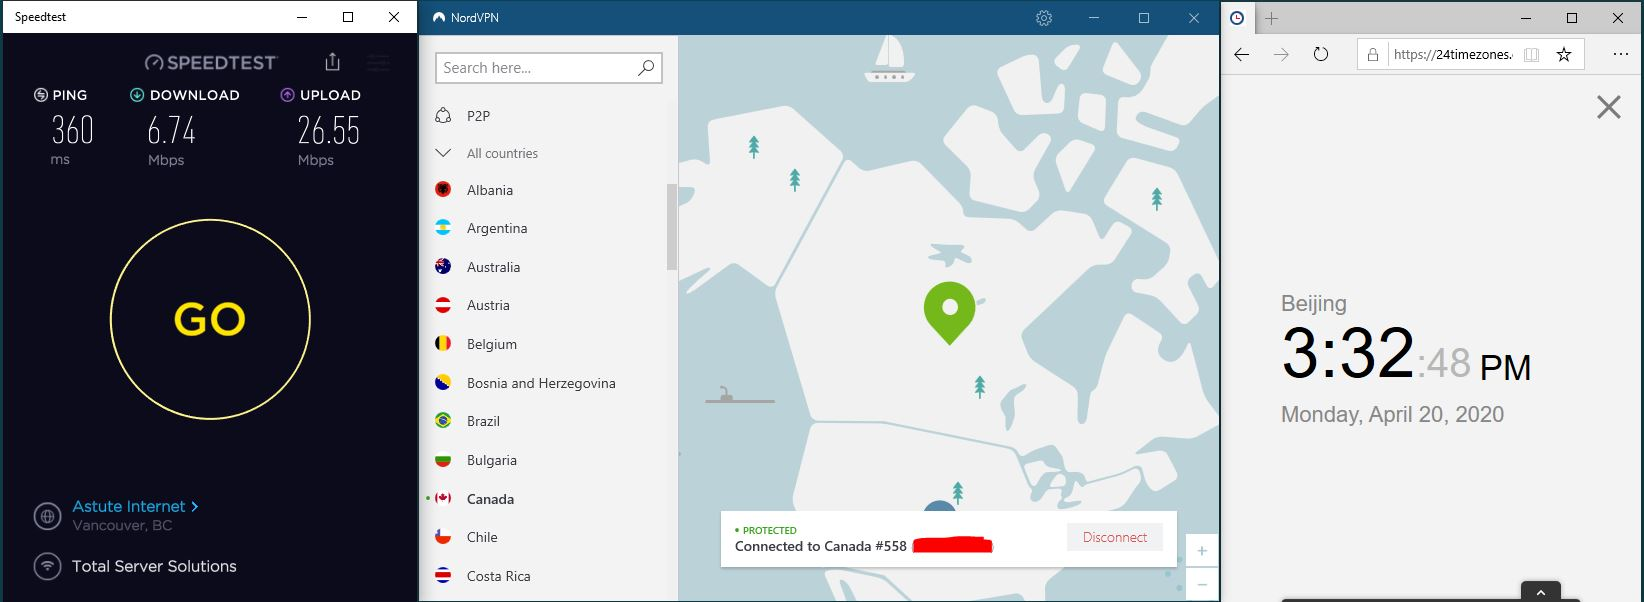 Windows10 NordVPN 混淆协议关闭 Canada 558 中国VPN 翻墙 科学上网 SpeedTest测速 20200420